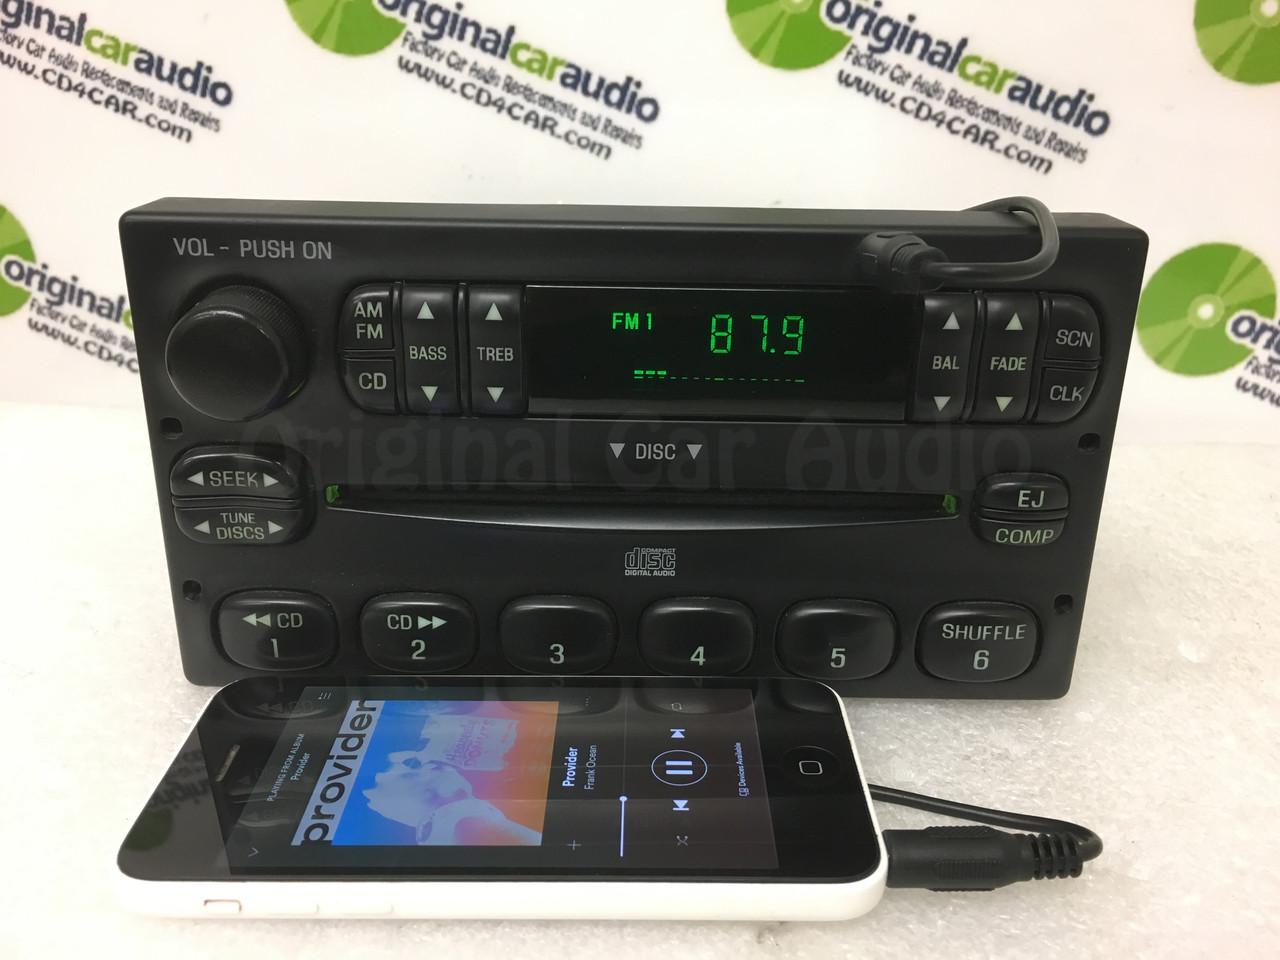 FORD AM FM Radio Stereo CD Player F150 Windstar Escape E150 ADDED ...